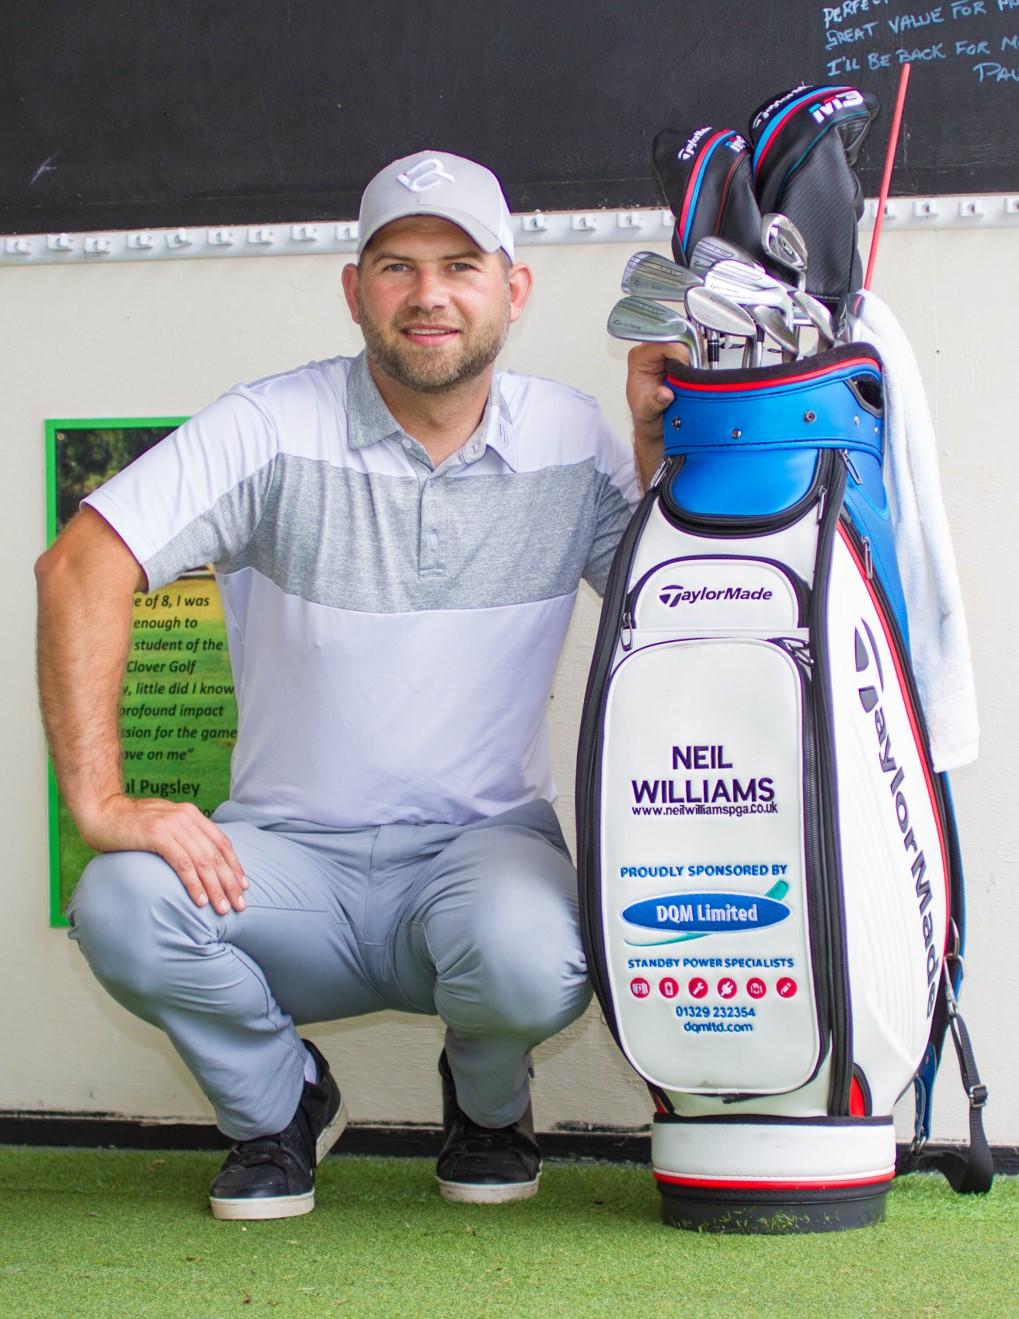 Neil Williams PGA.jpg